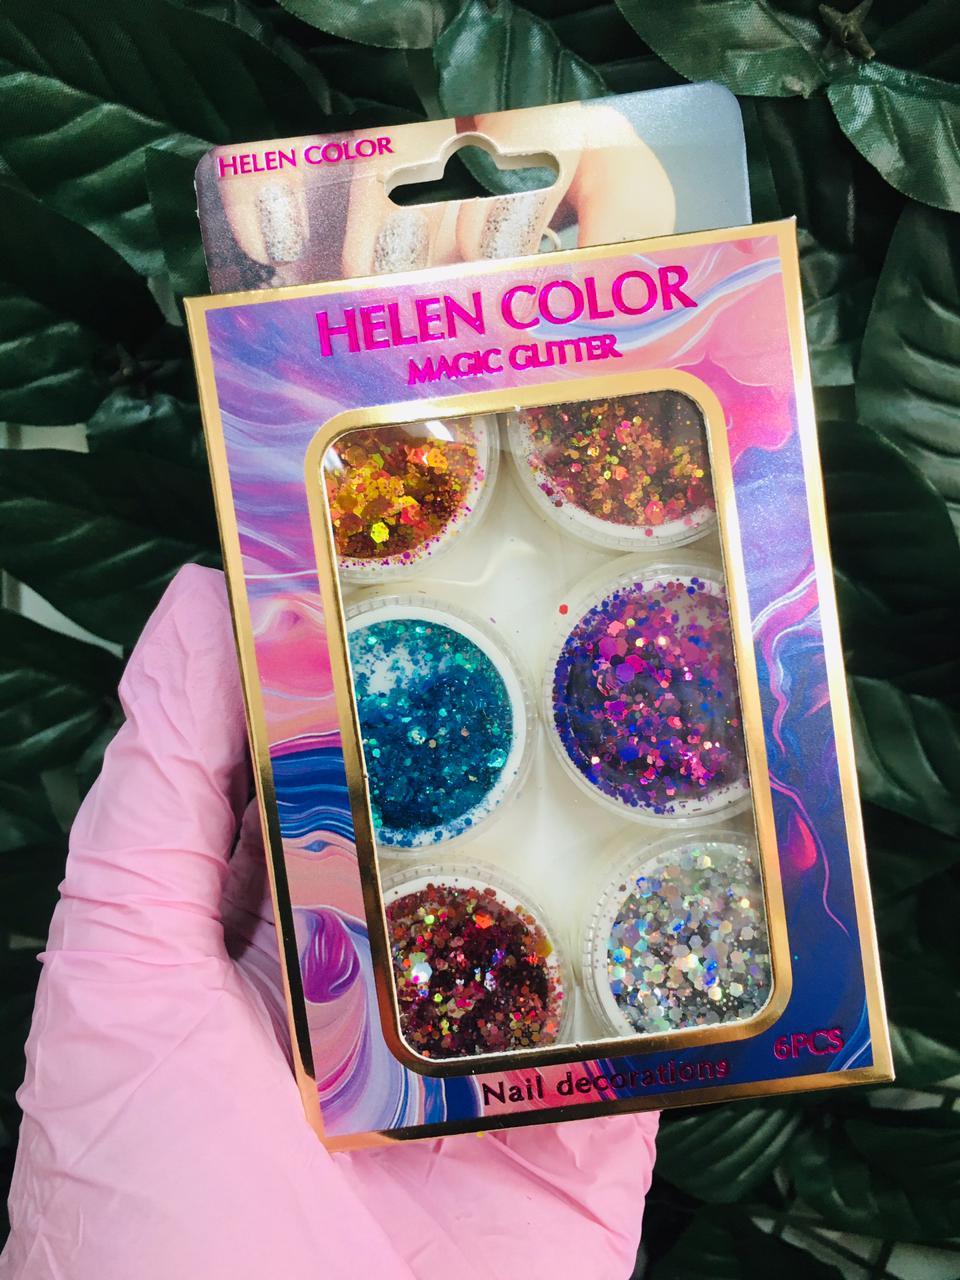 Glitter helen color Flocado   - Sílvia Pedrarias & Cia